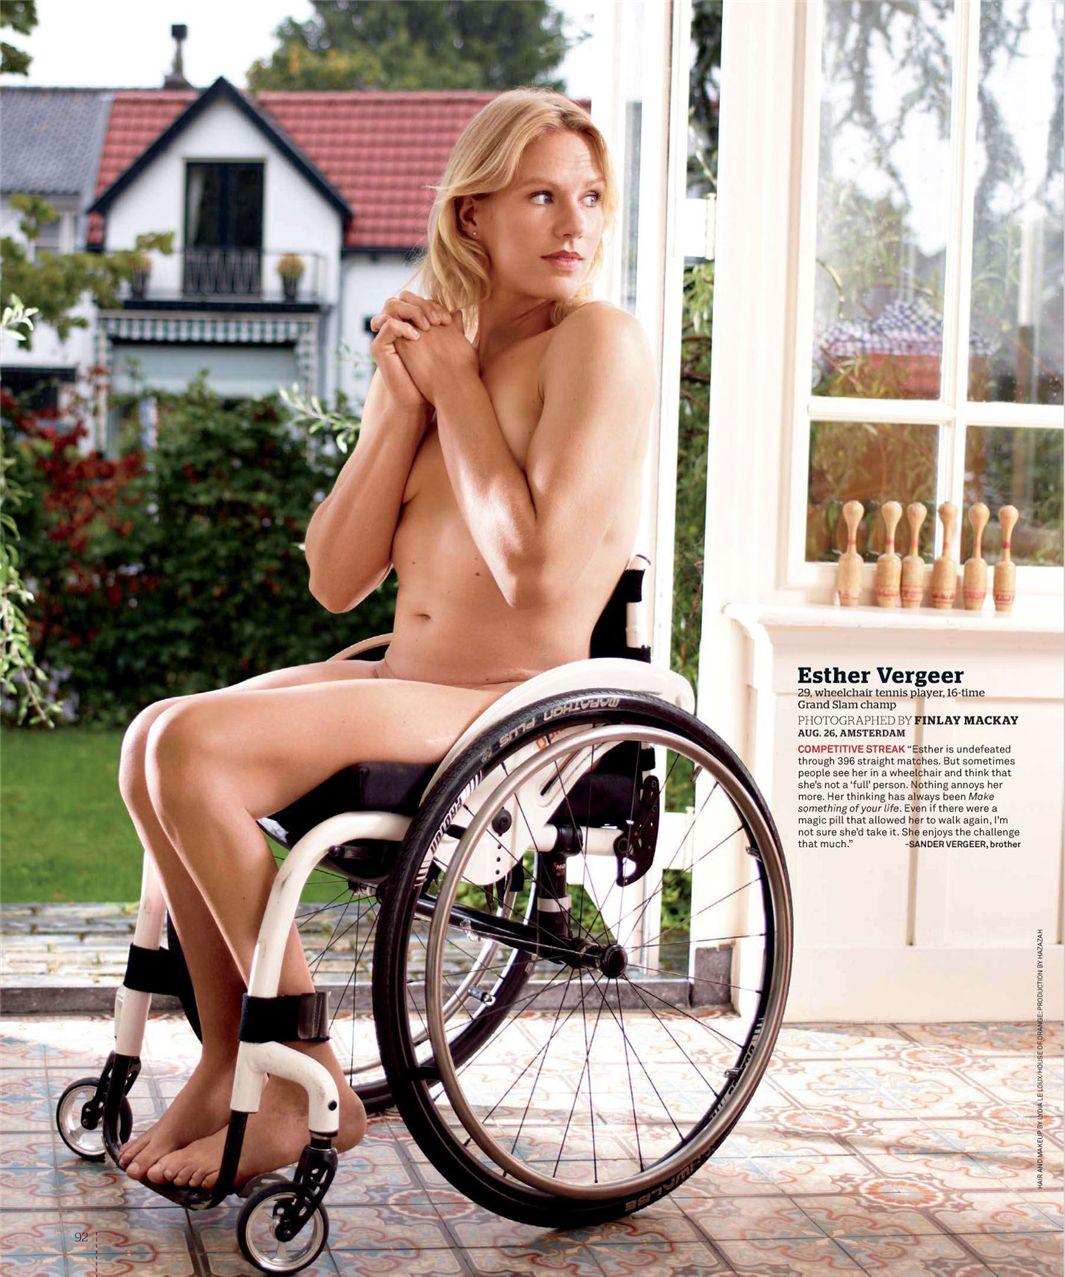 Эстер Вергеер / Esther Vergeer - ESPN Magazine Body Issue 18 october 2010